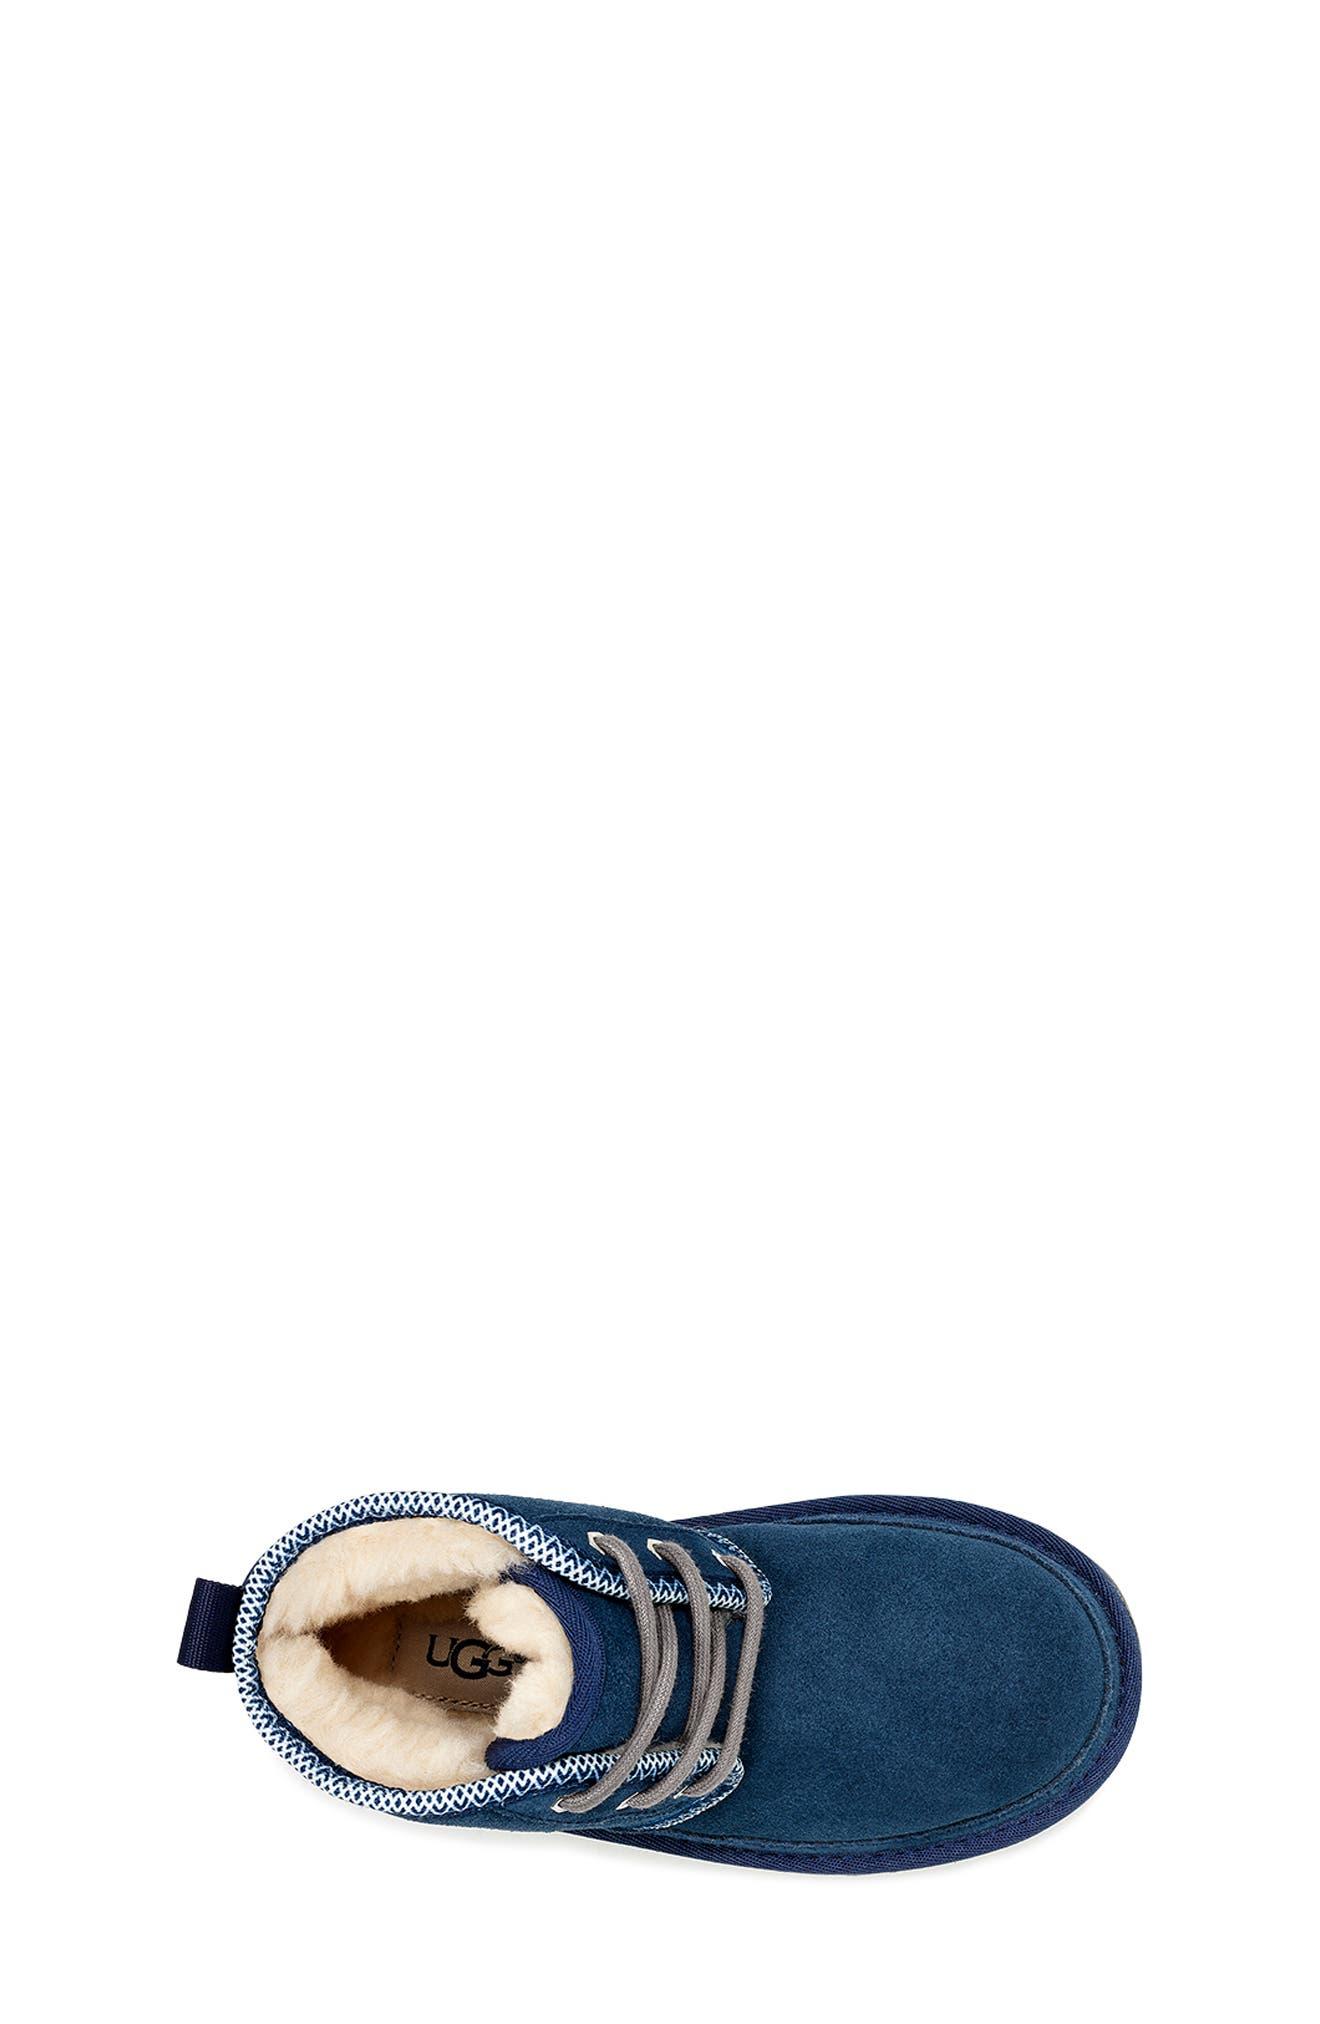 Neumel II Tasman Genuine Shearling Chukka Boot,                             Alternate thumbnail 4, color,                             NAVY / TASMAN